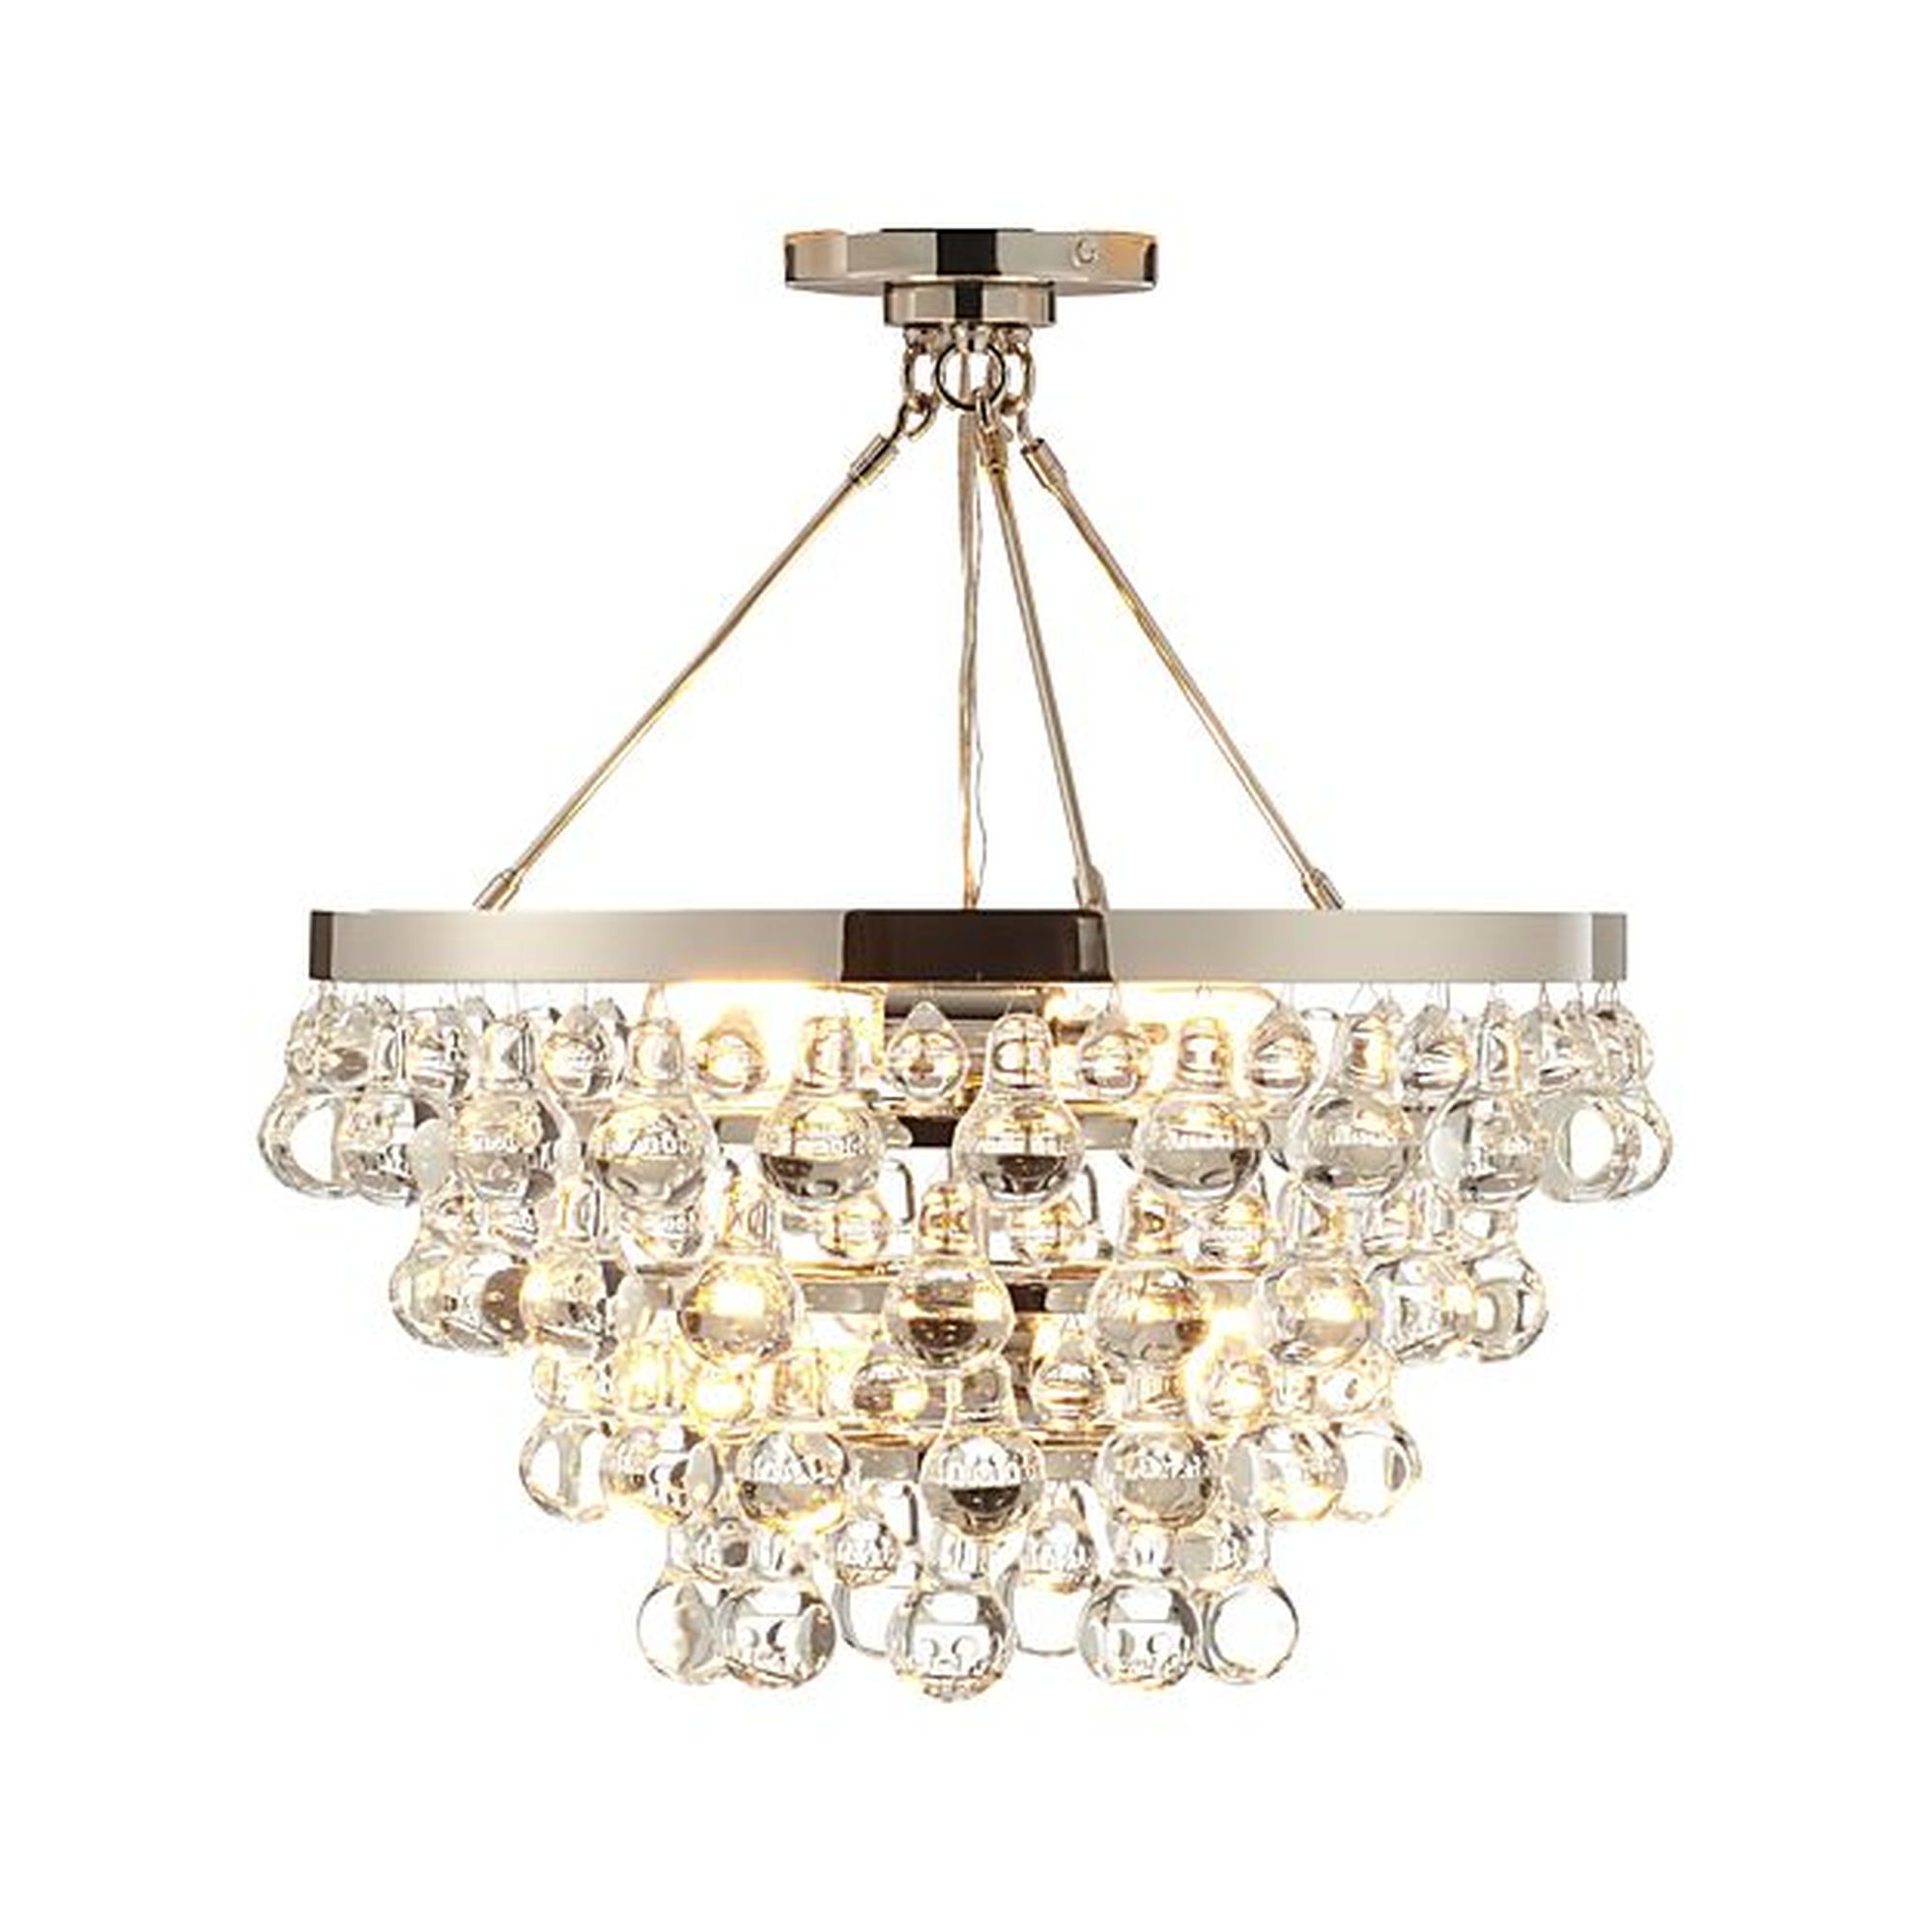 Lure polished nickel chandelier online shopping product by crate lure polished nickel chandelier arubaitofo Choice Image